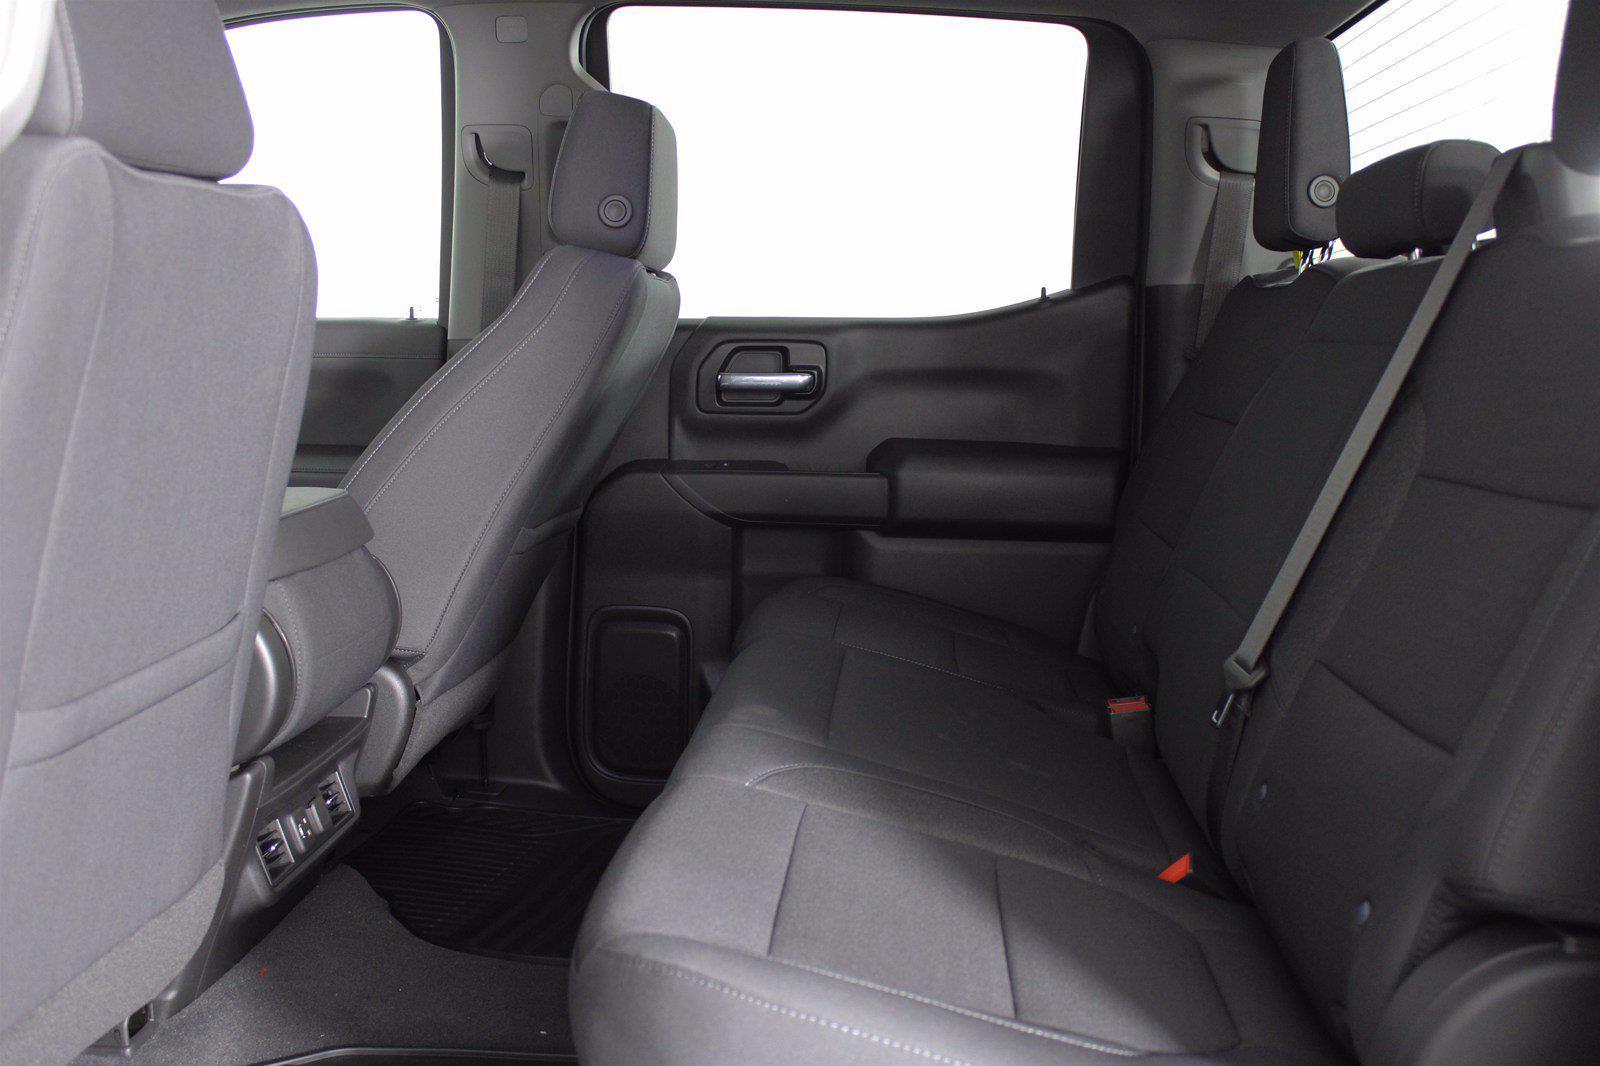 2021 Chevrolet Silverado 1500 Crew Cab 4x4, Pickup #D111137 - photo 16